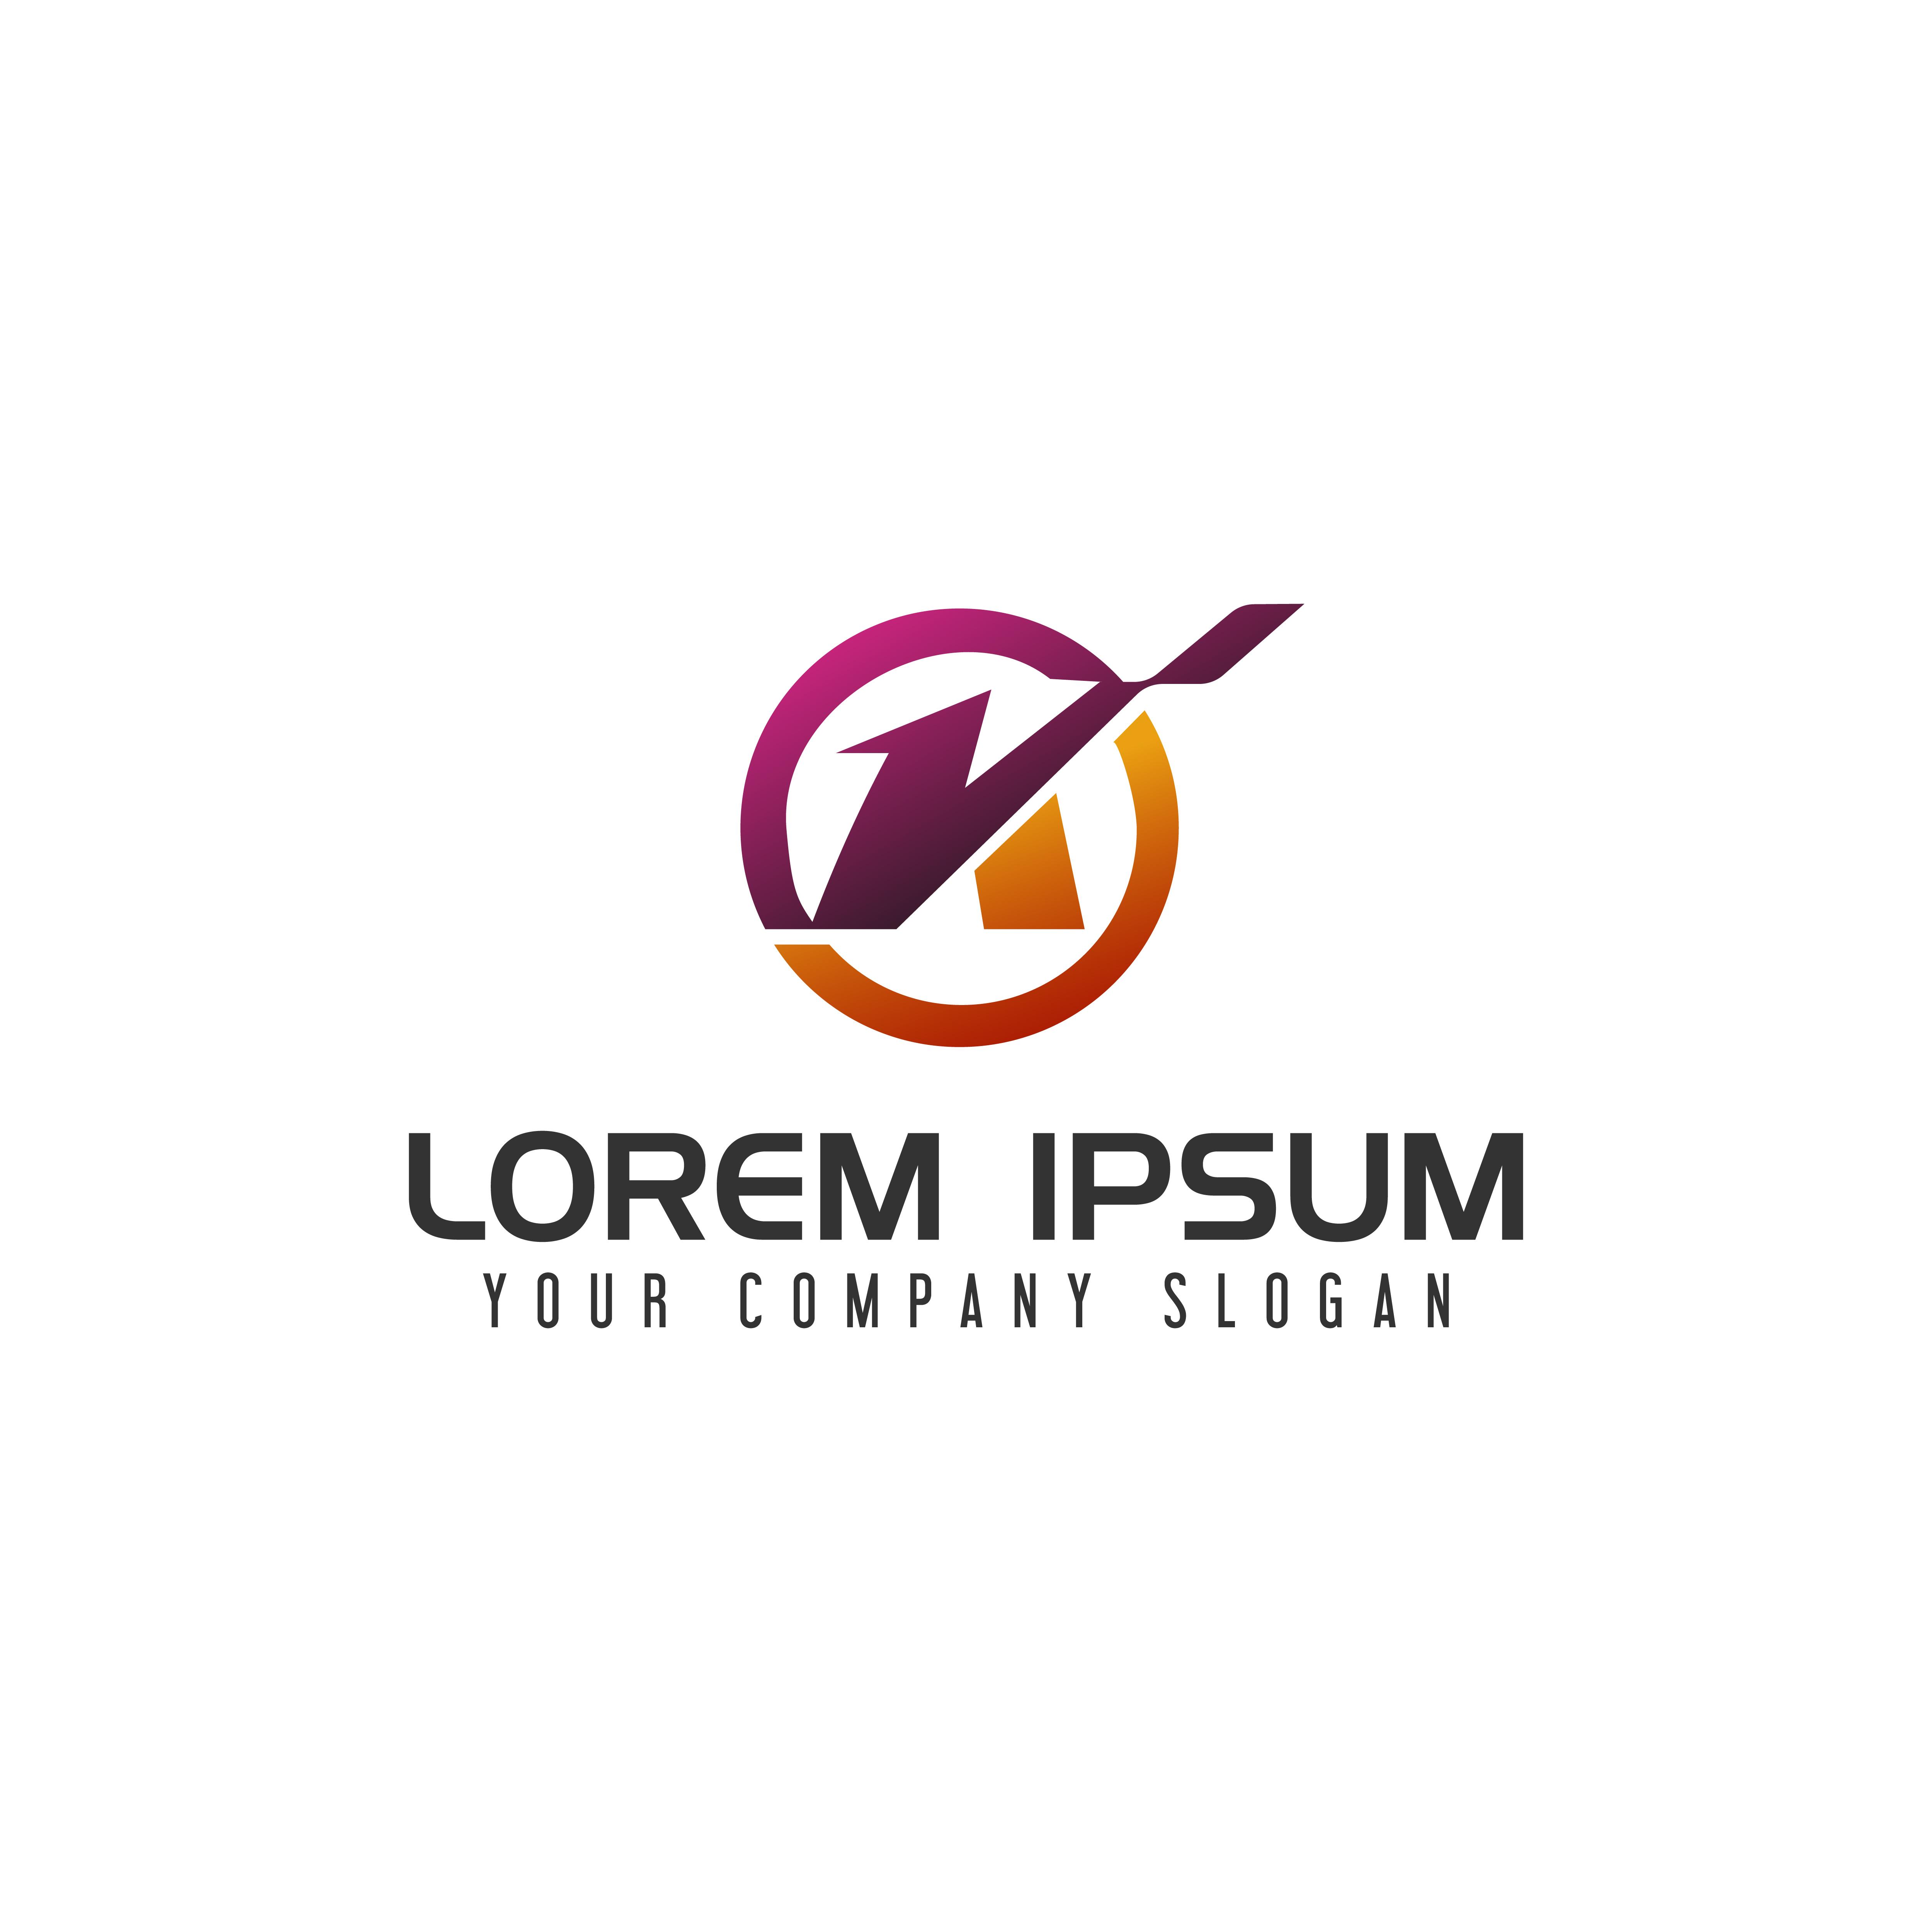 Modern Letter K Logo Concept:  Letter K Logo Design Concept Template 606616